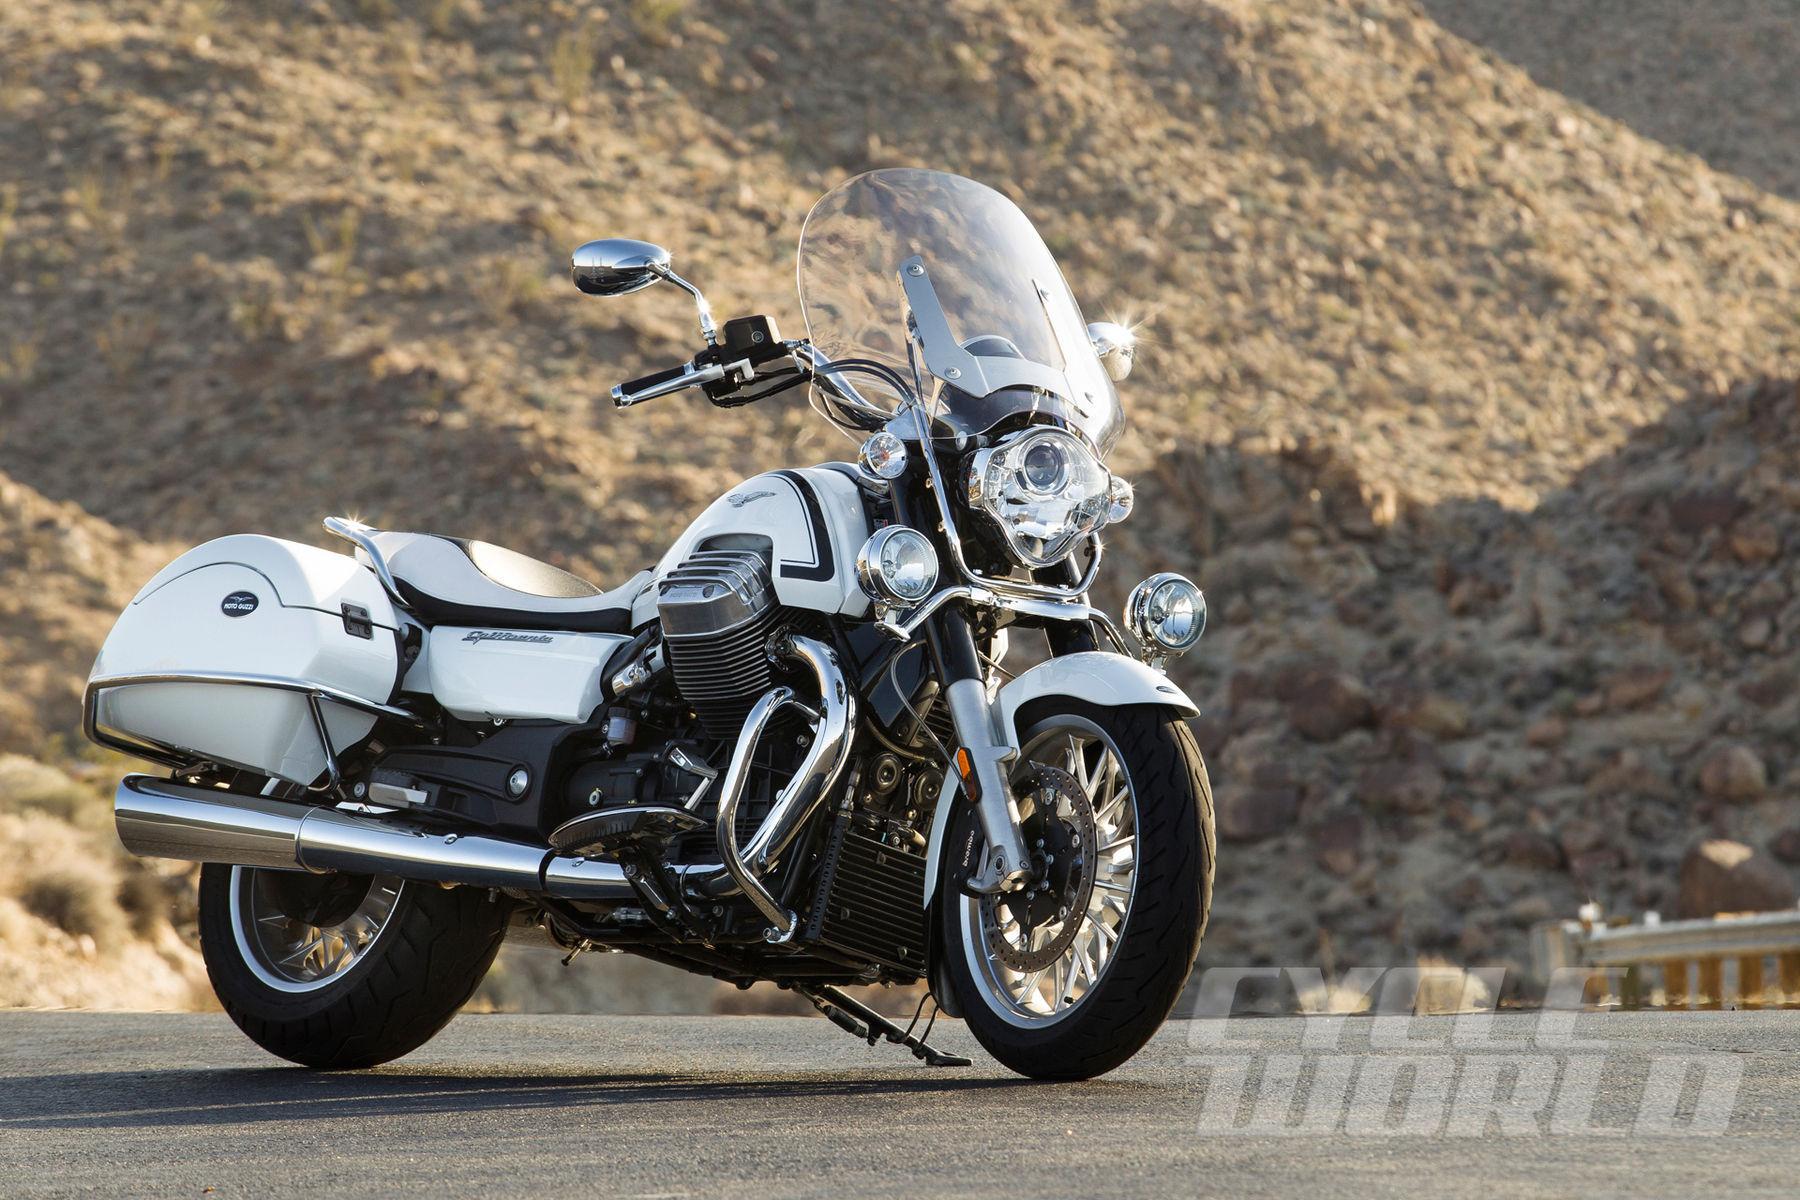 Moto Guzzi  | Honda CTX1300 Deluxe vs. Moto Guzzi California 1400 Touring – Comparison Test